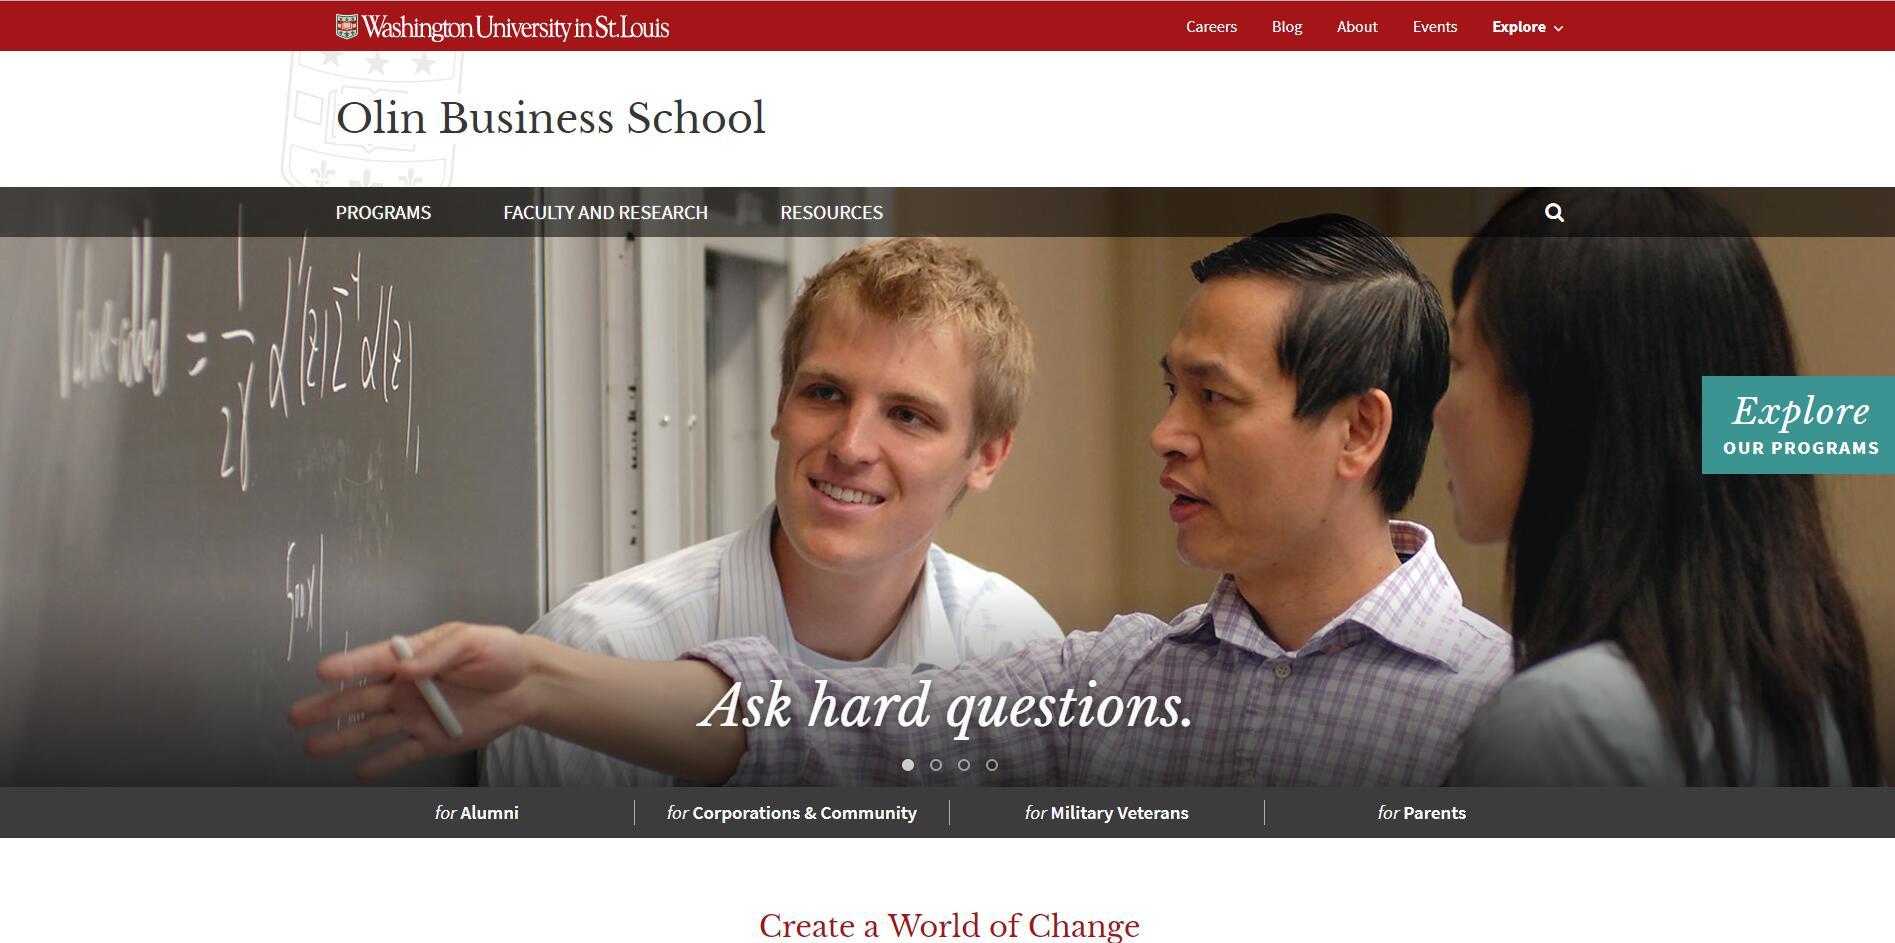 The Olin Business School at Washington University in St. Louis